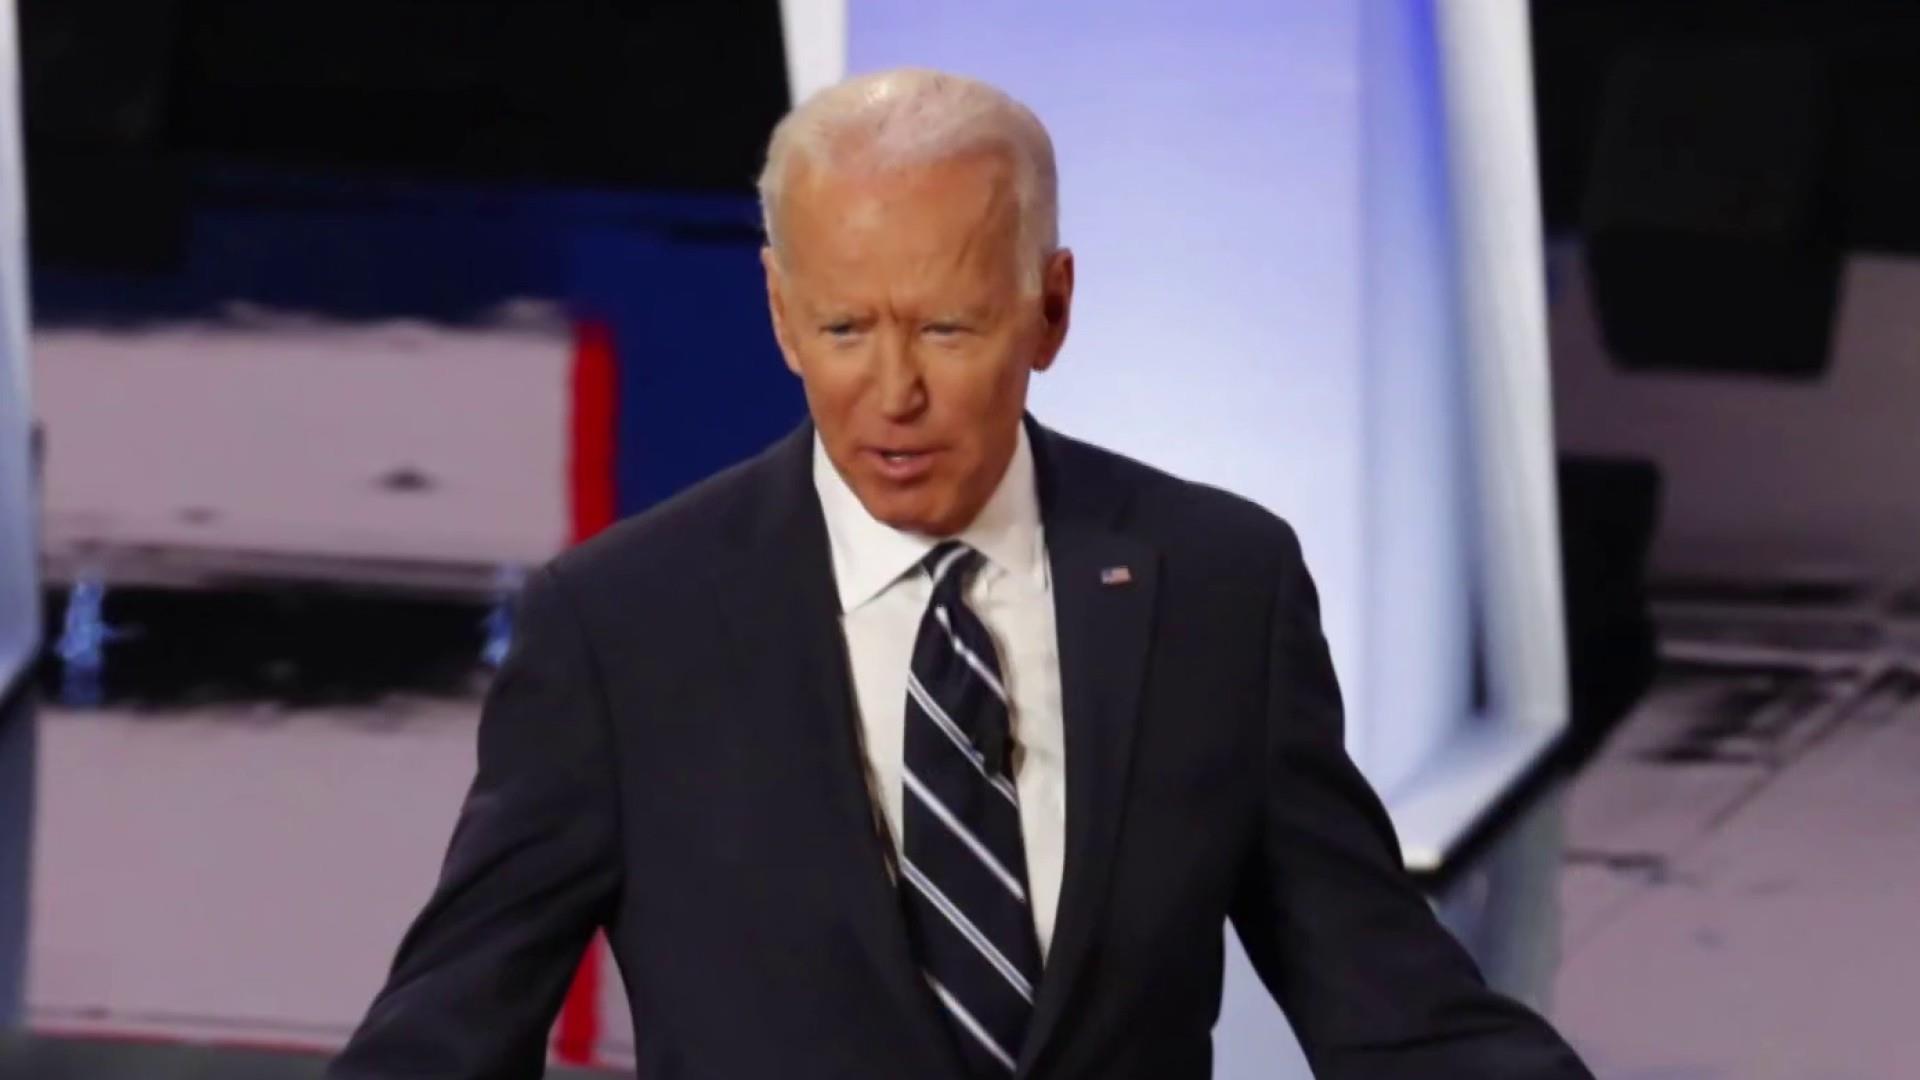 Is Joe Biden's 'okay' performance good enough to take on Donald Trump?